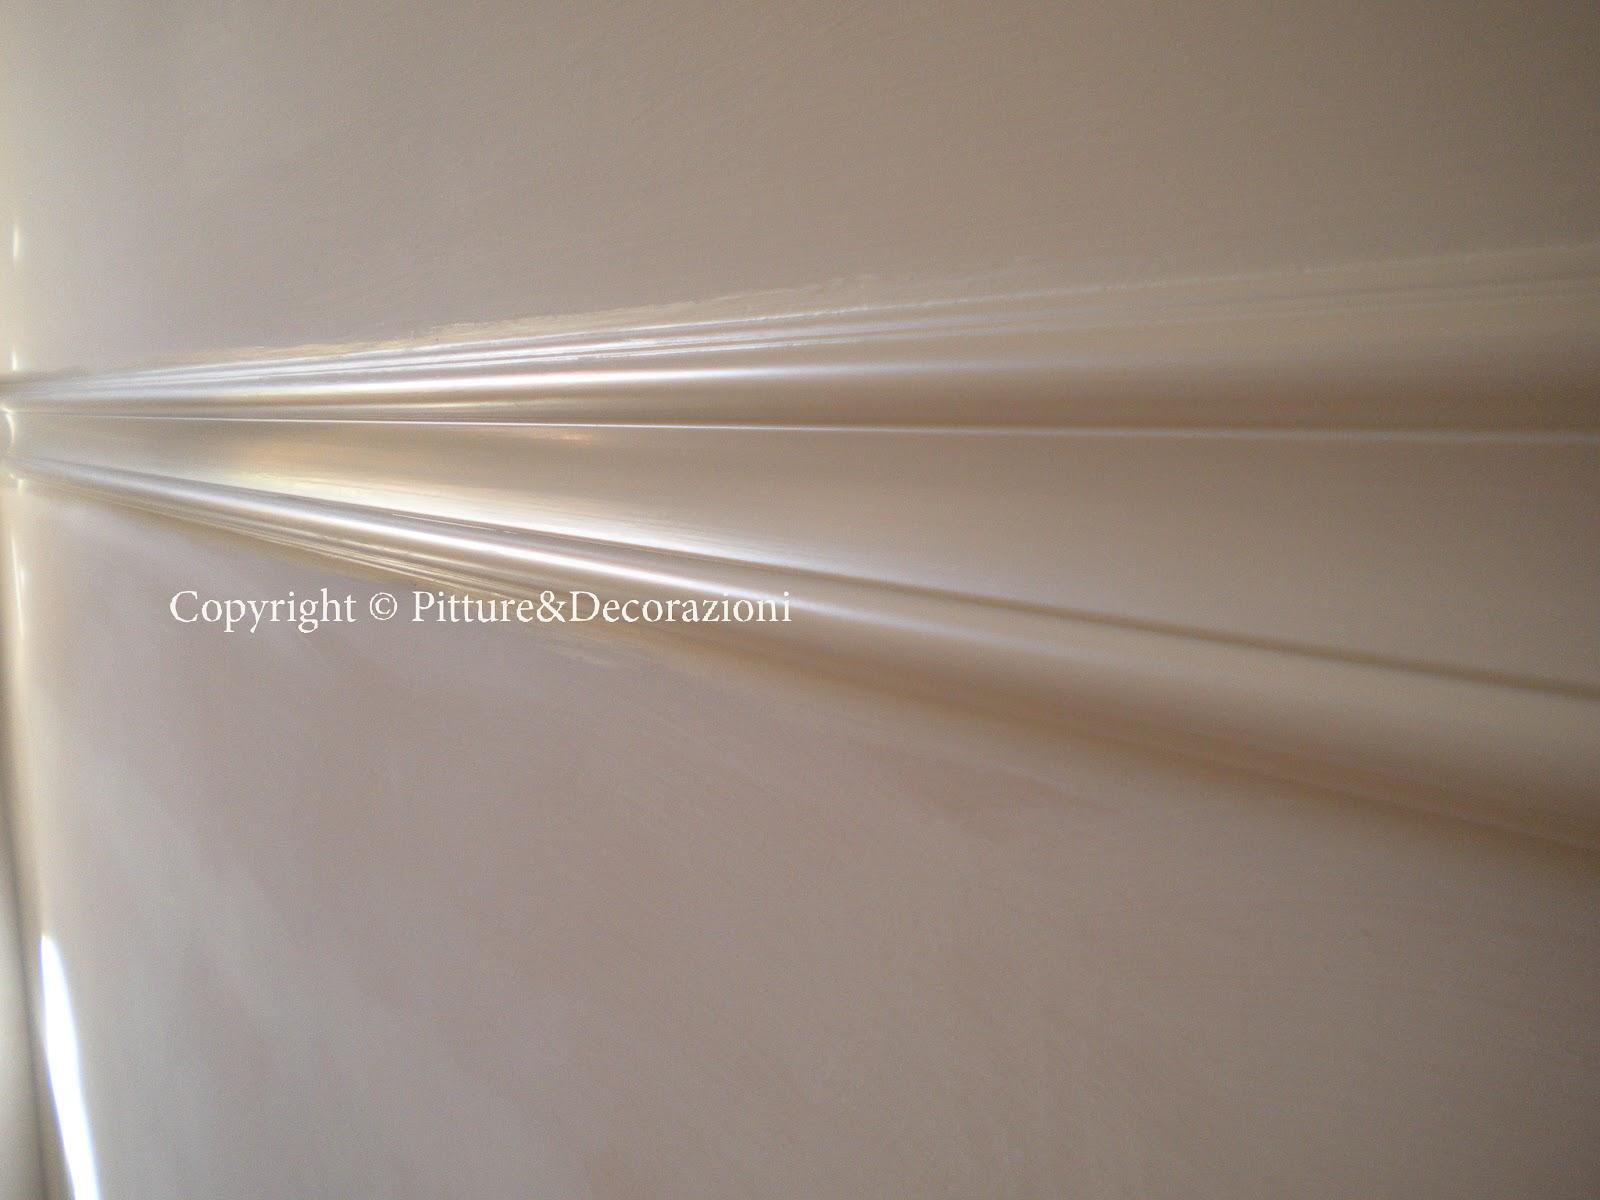 Pareti cucina smalto gallery of colore parete cucina bianca per cucina blu e bianca una - Smalto per piastrelle cucina ...